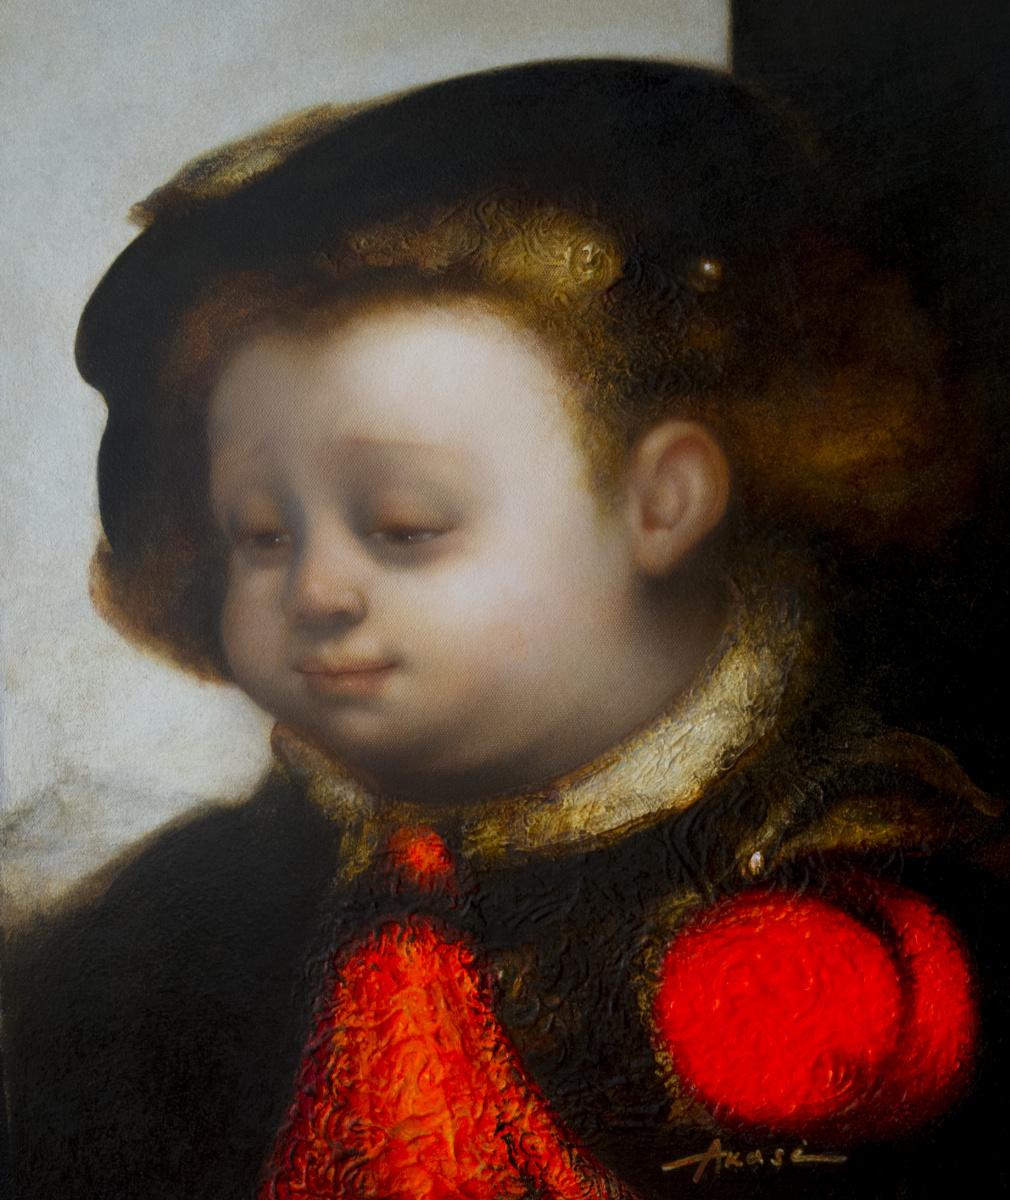 Ольга Акаси. Portrait of a boy